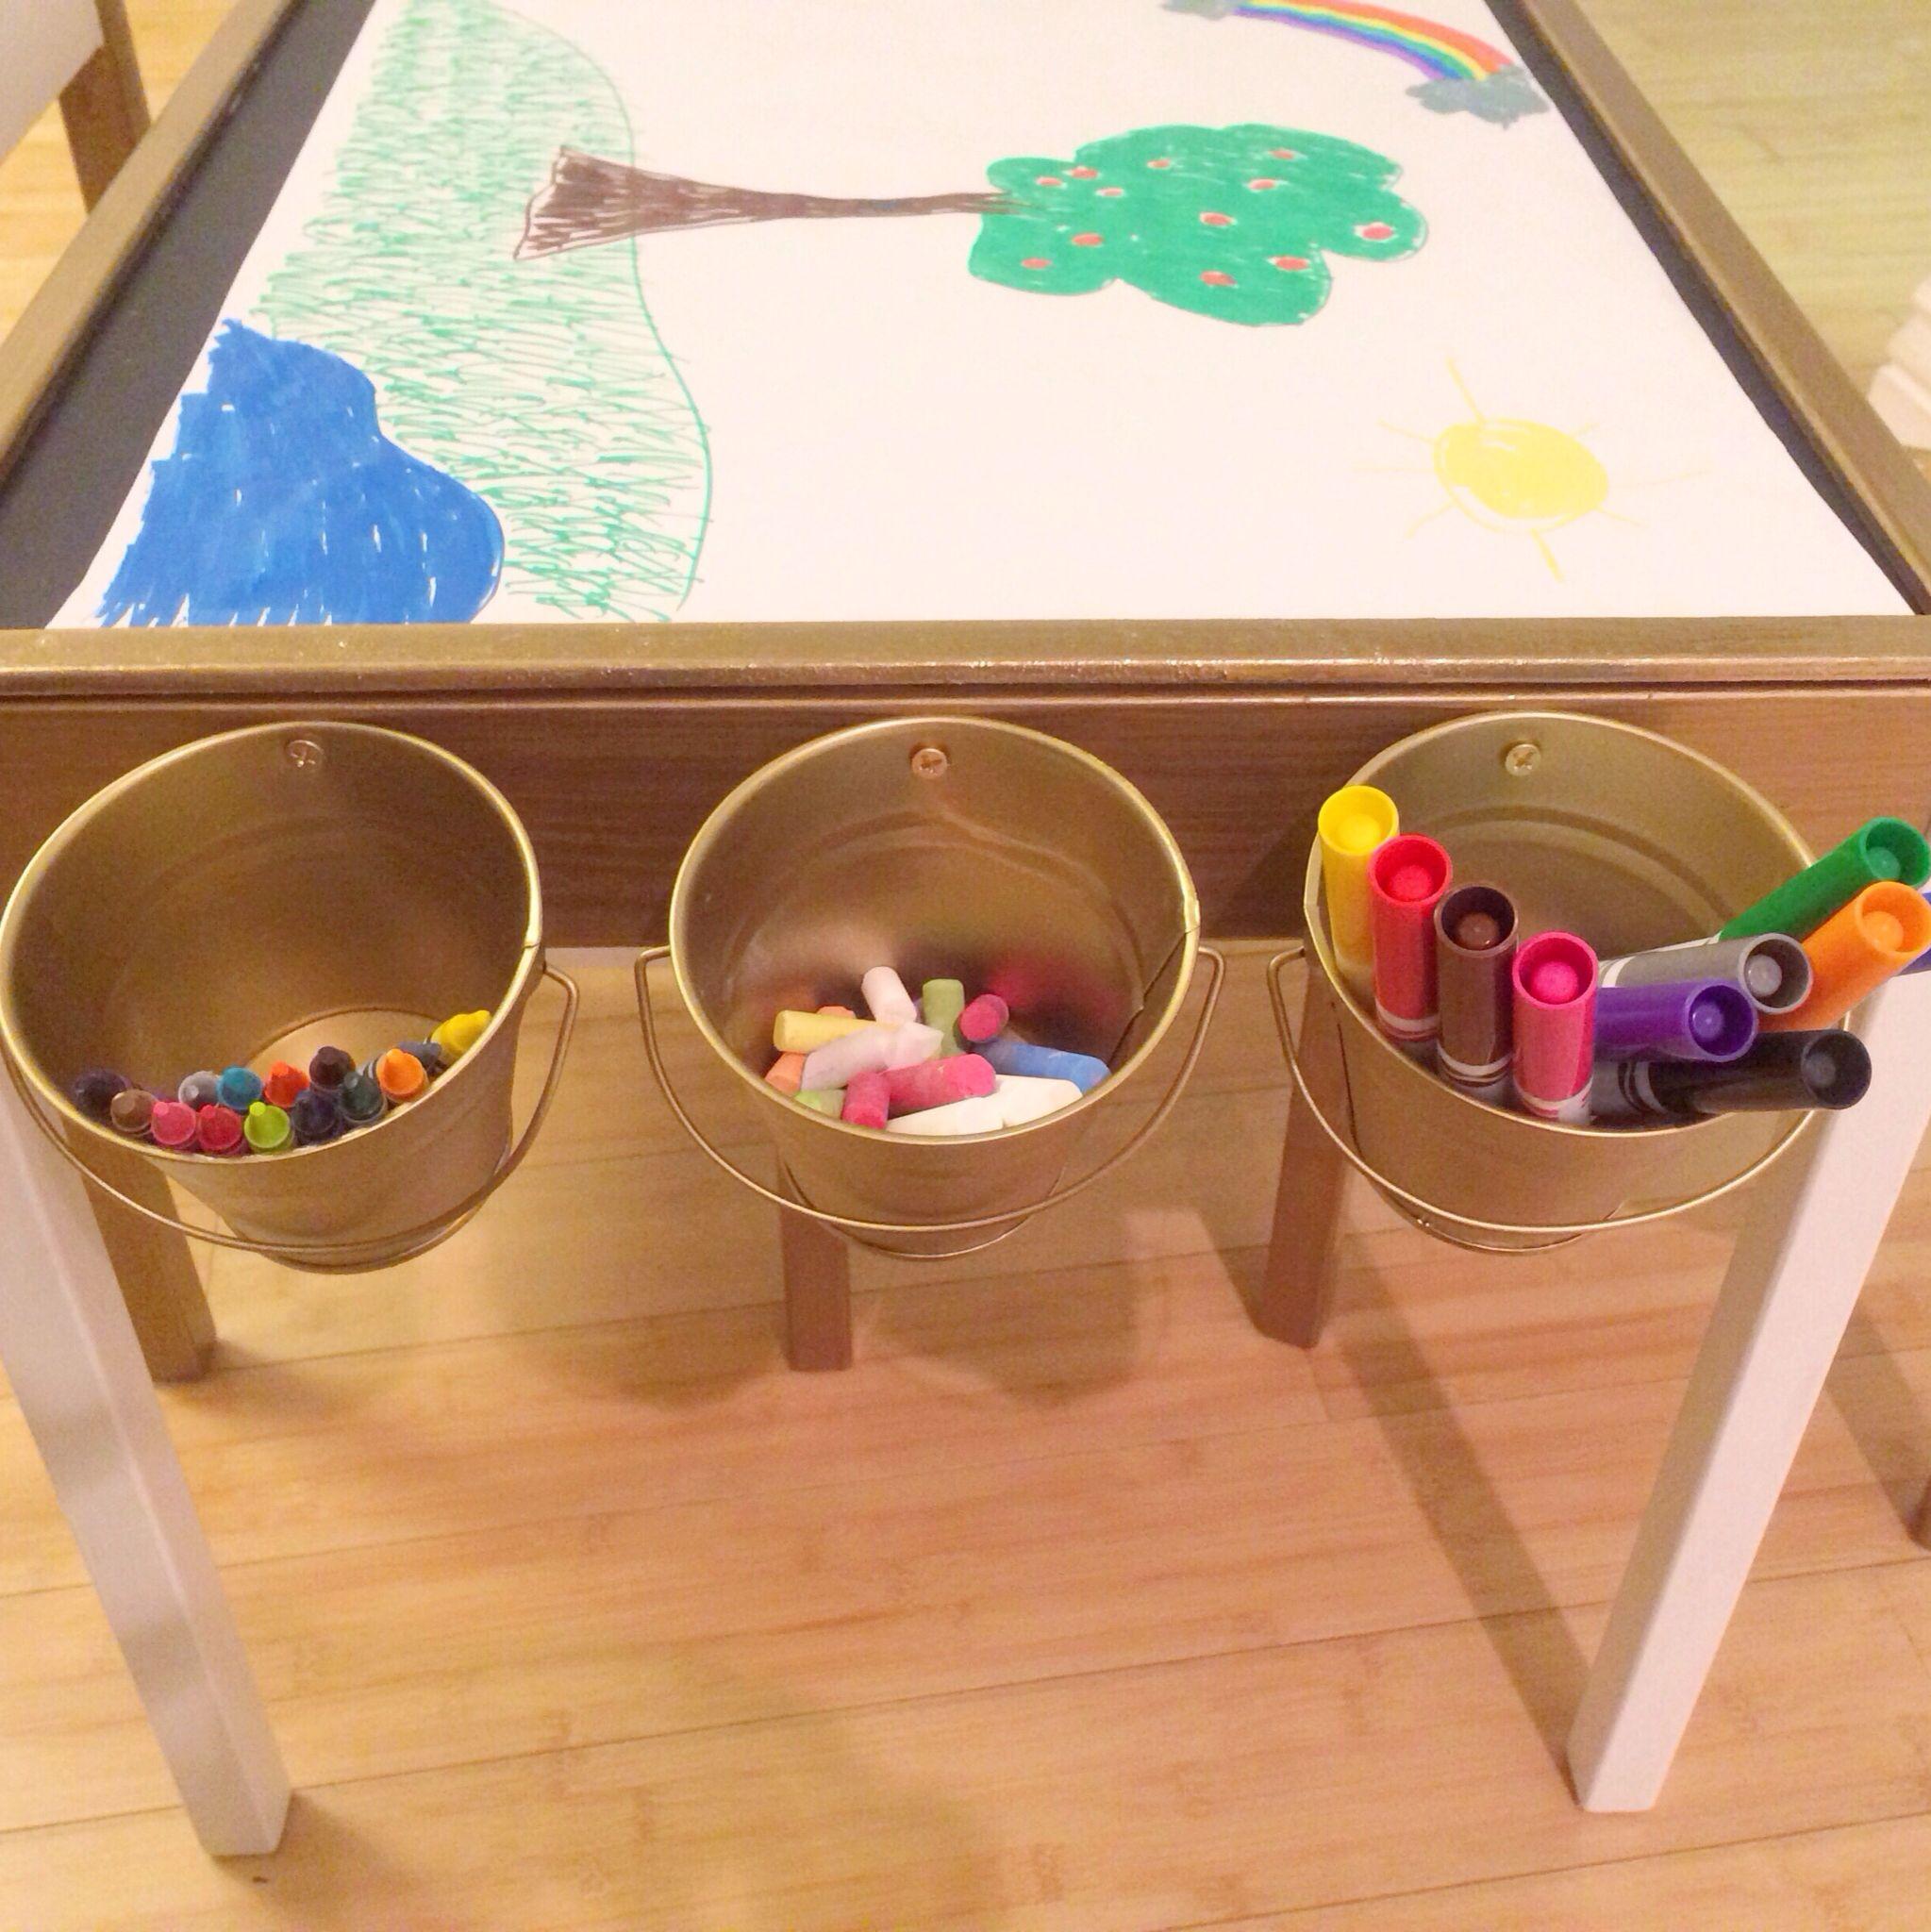 Our Ikea Latt Hack Art Table! Vinyl Upholstered Seats, Chalkboard Top, Roll  Of